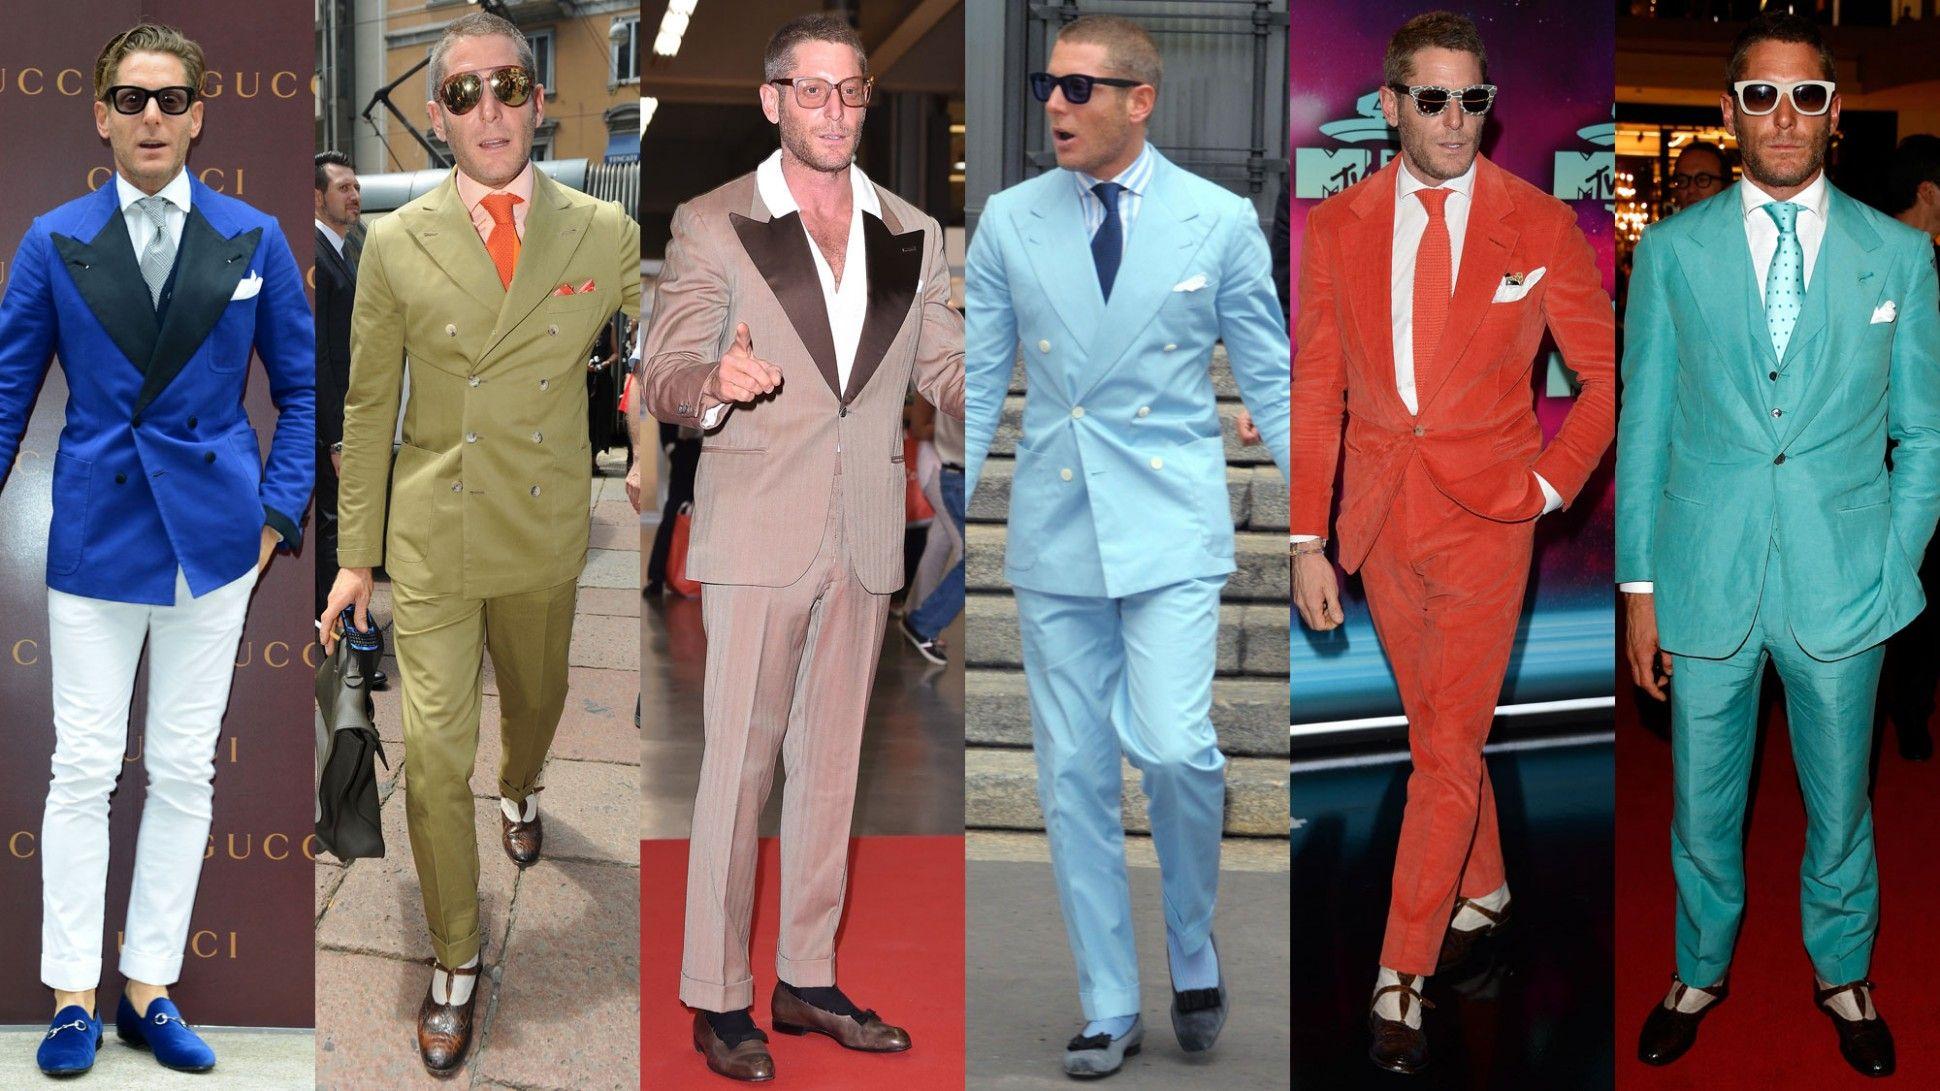 Amazing Camo Prom Suit Pictures Inspiration - Wedding Ideas ...